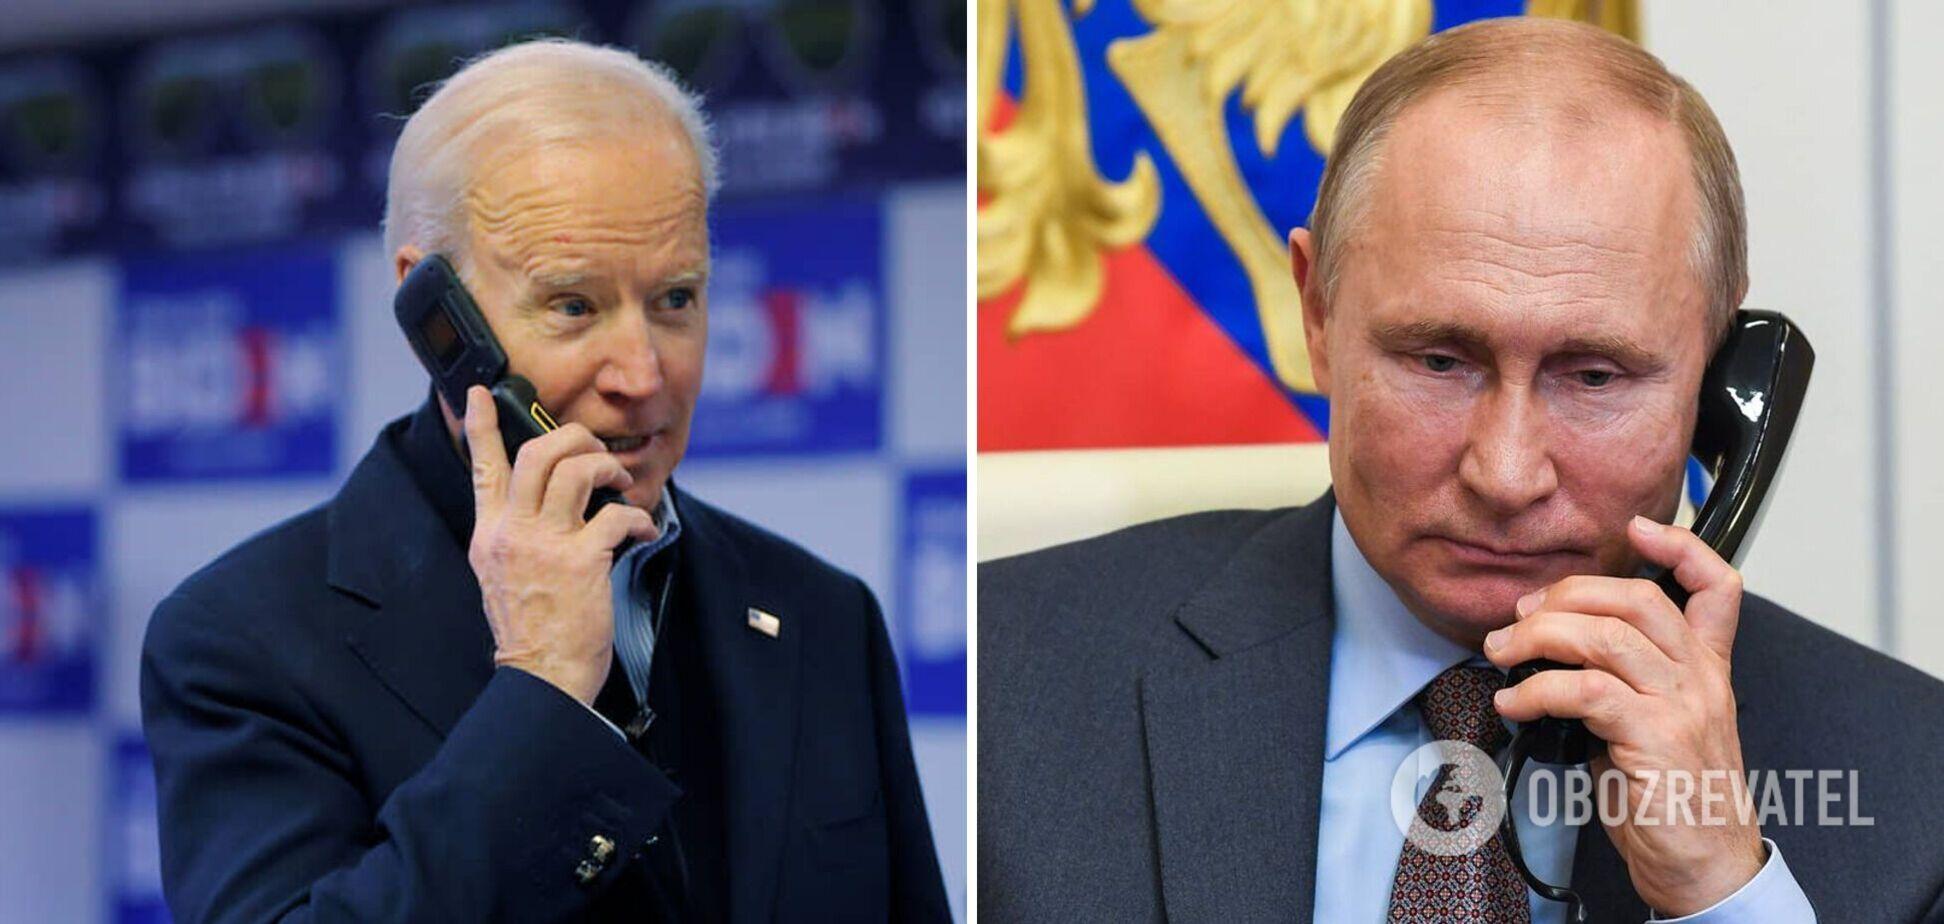 Байден пригласил Путина на климатический саммит